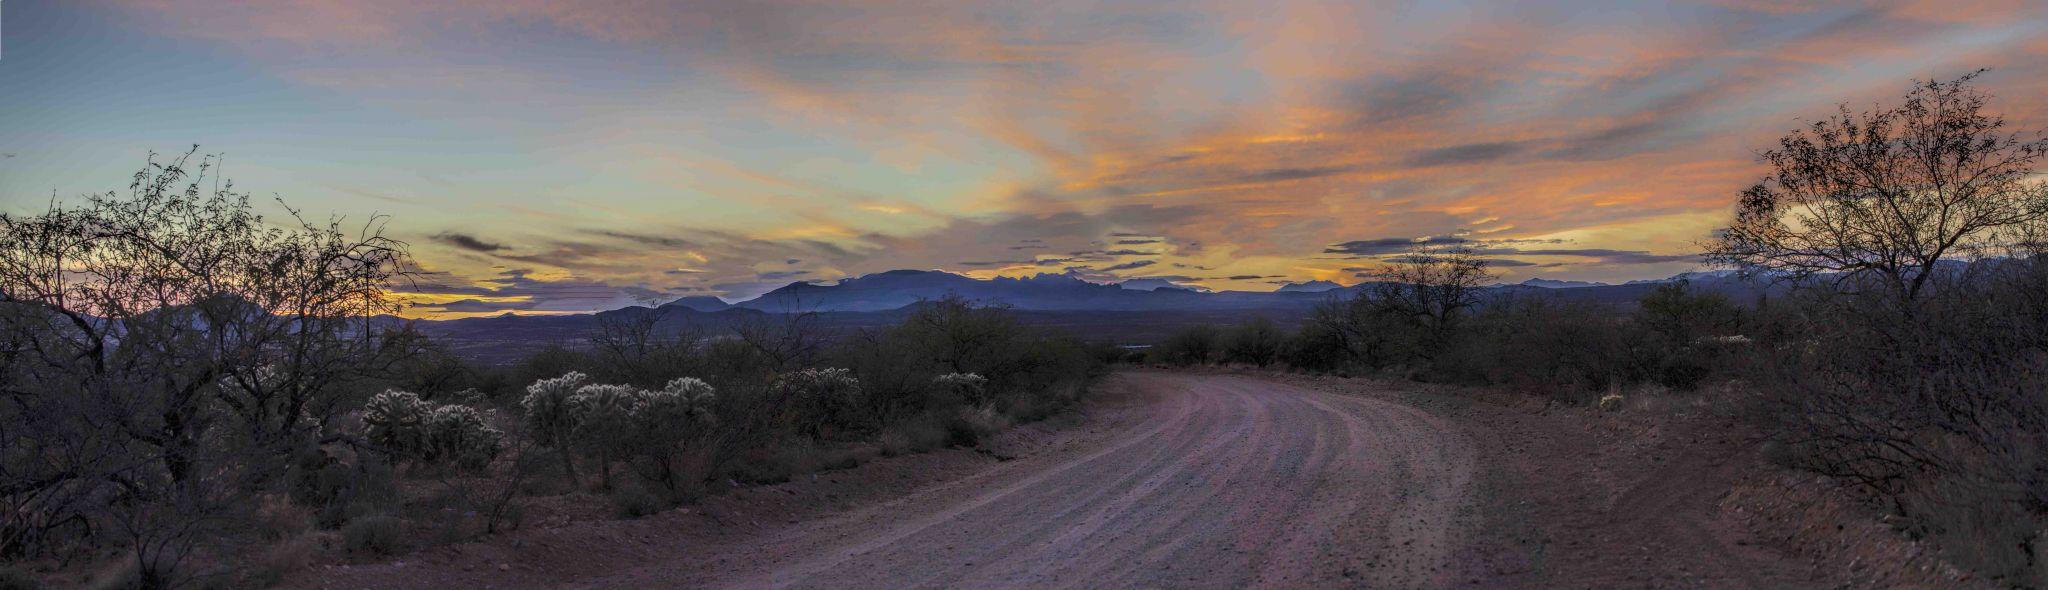 Sunset over the Santa Rita Mountains, USA